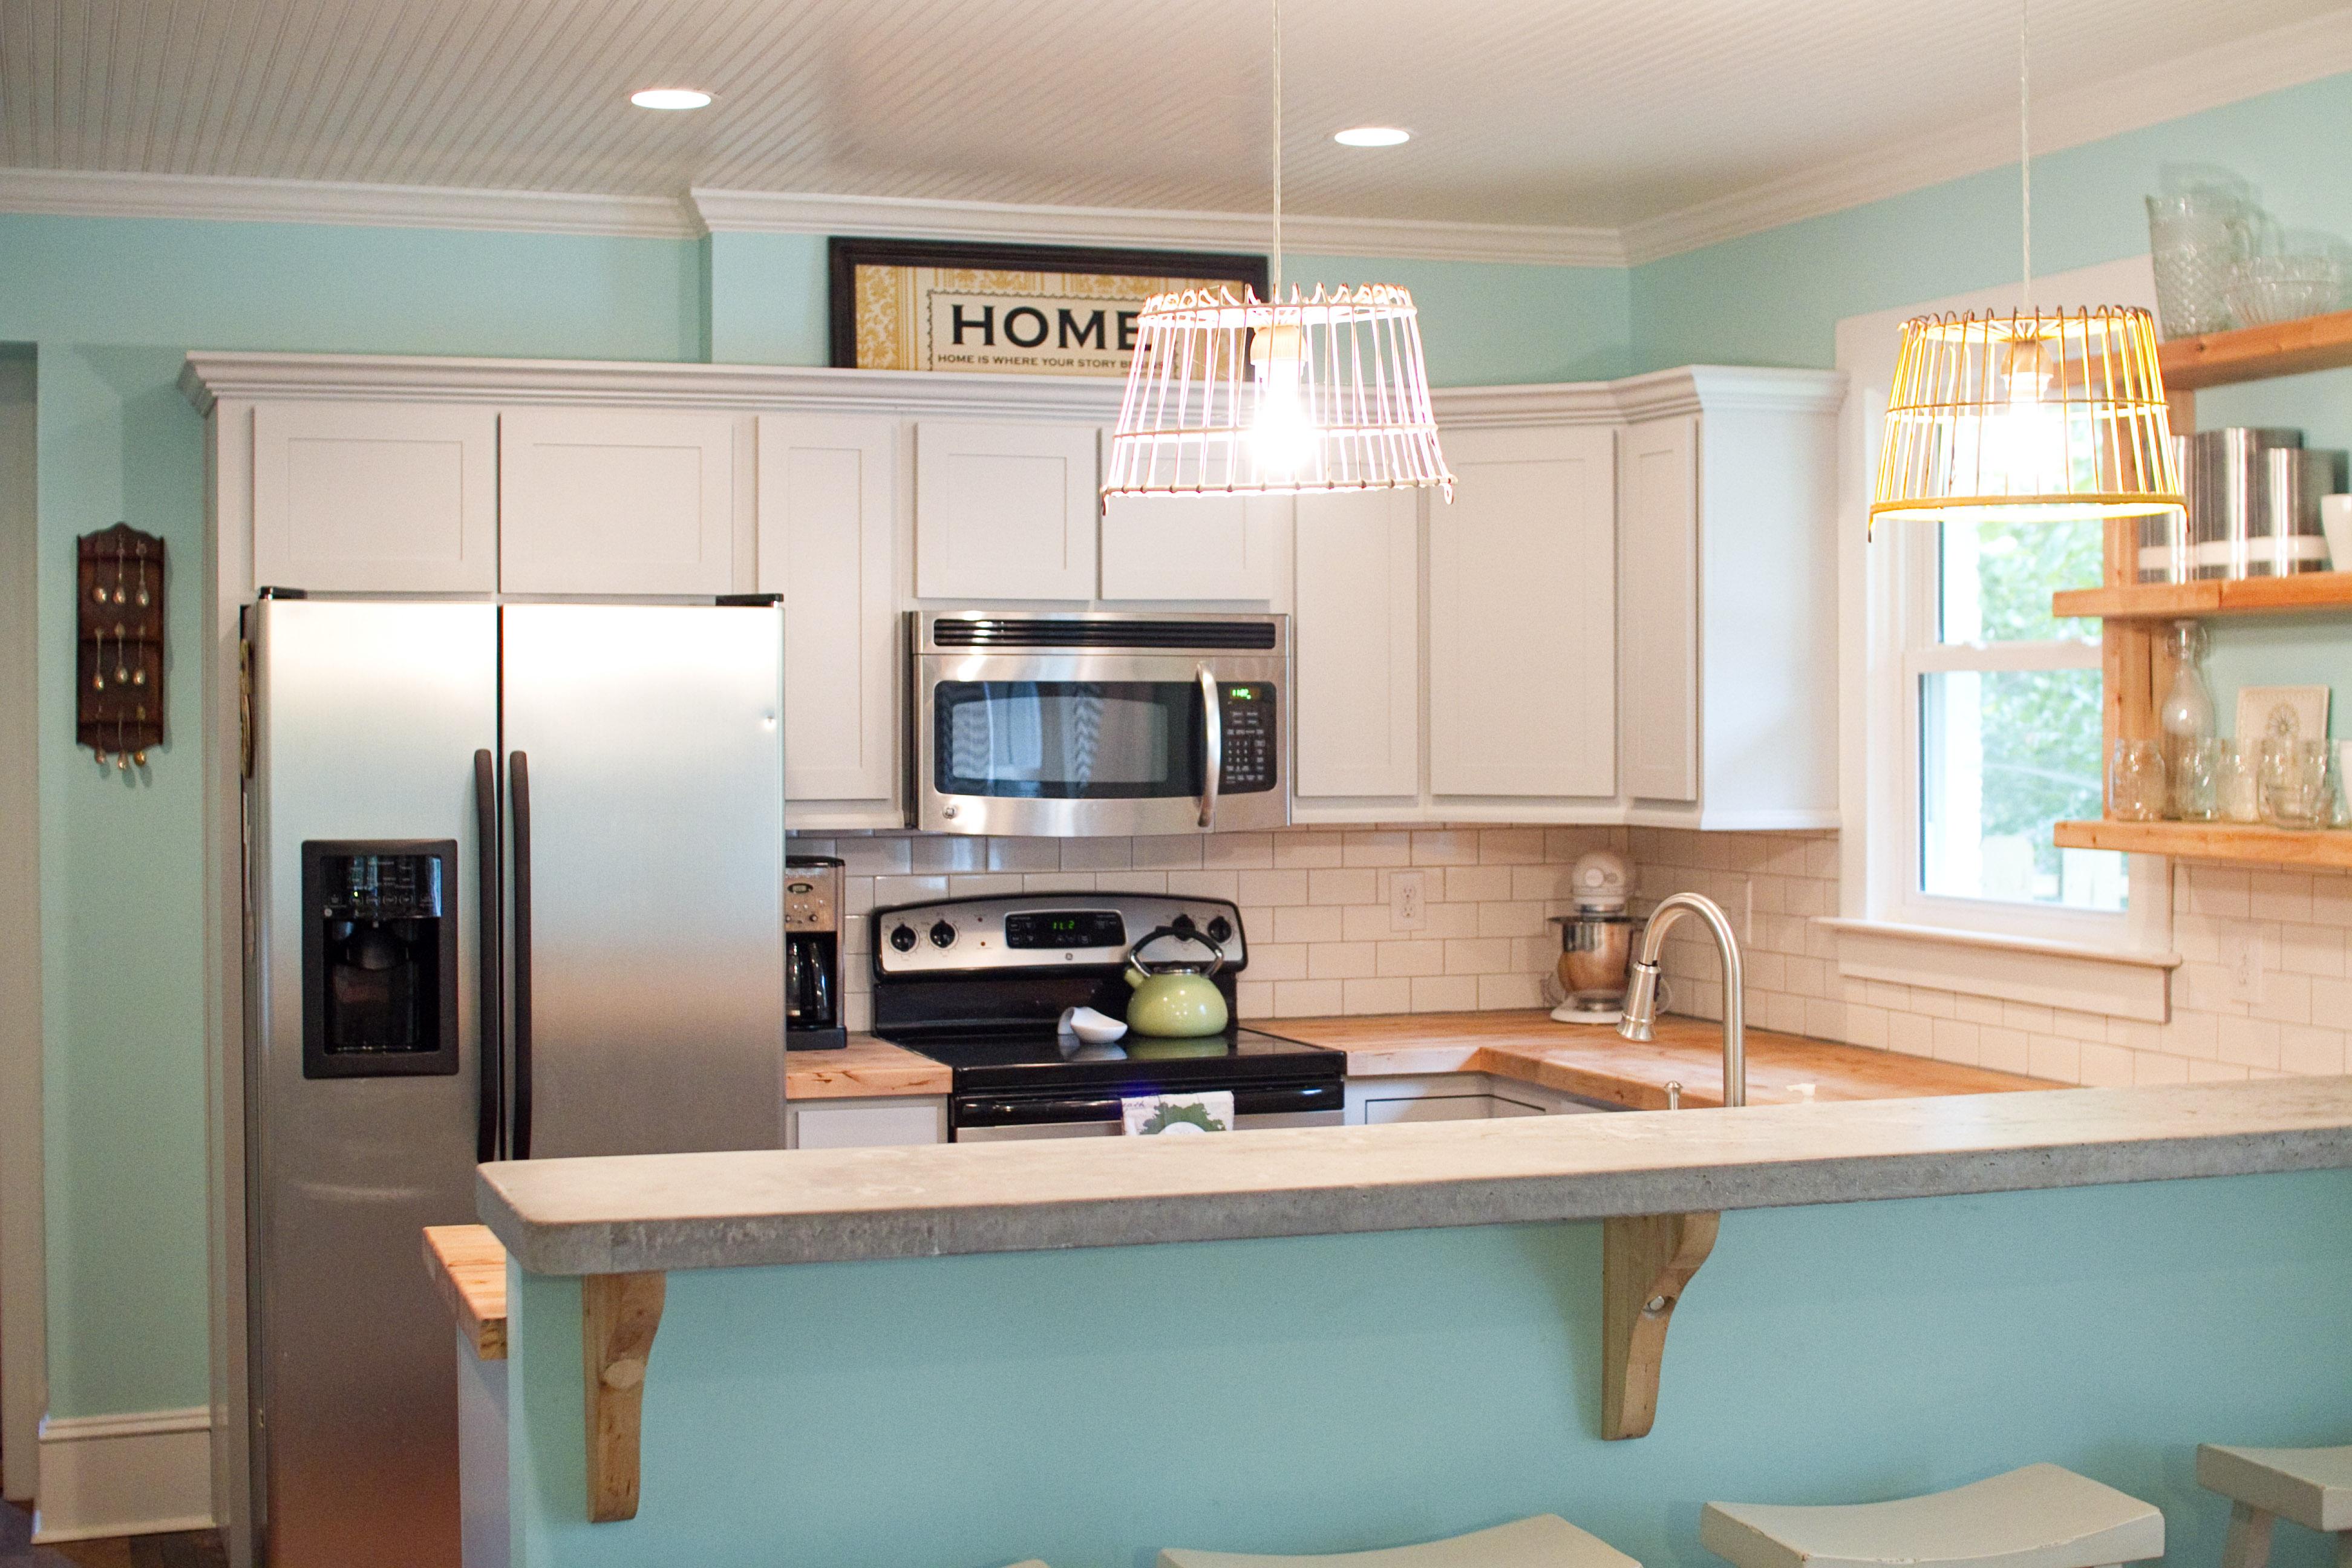 diy small kitchen design ideas photo - 7